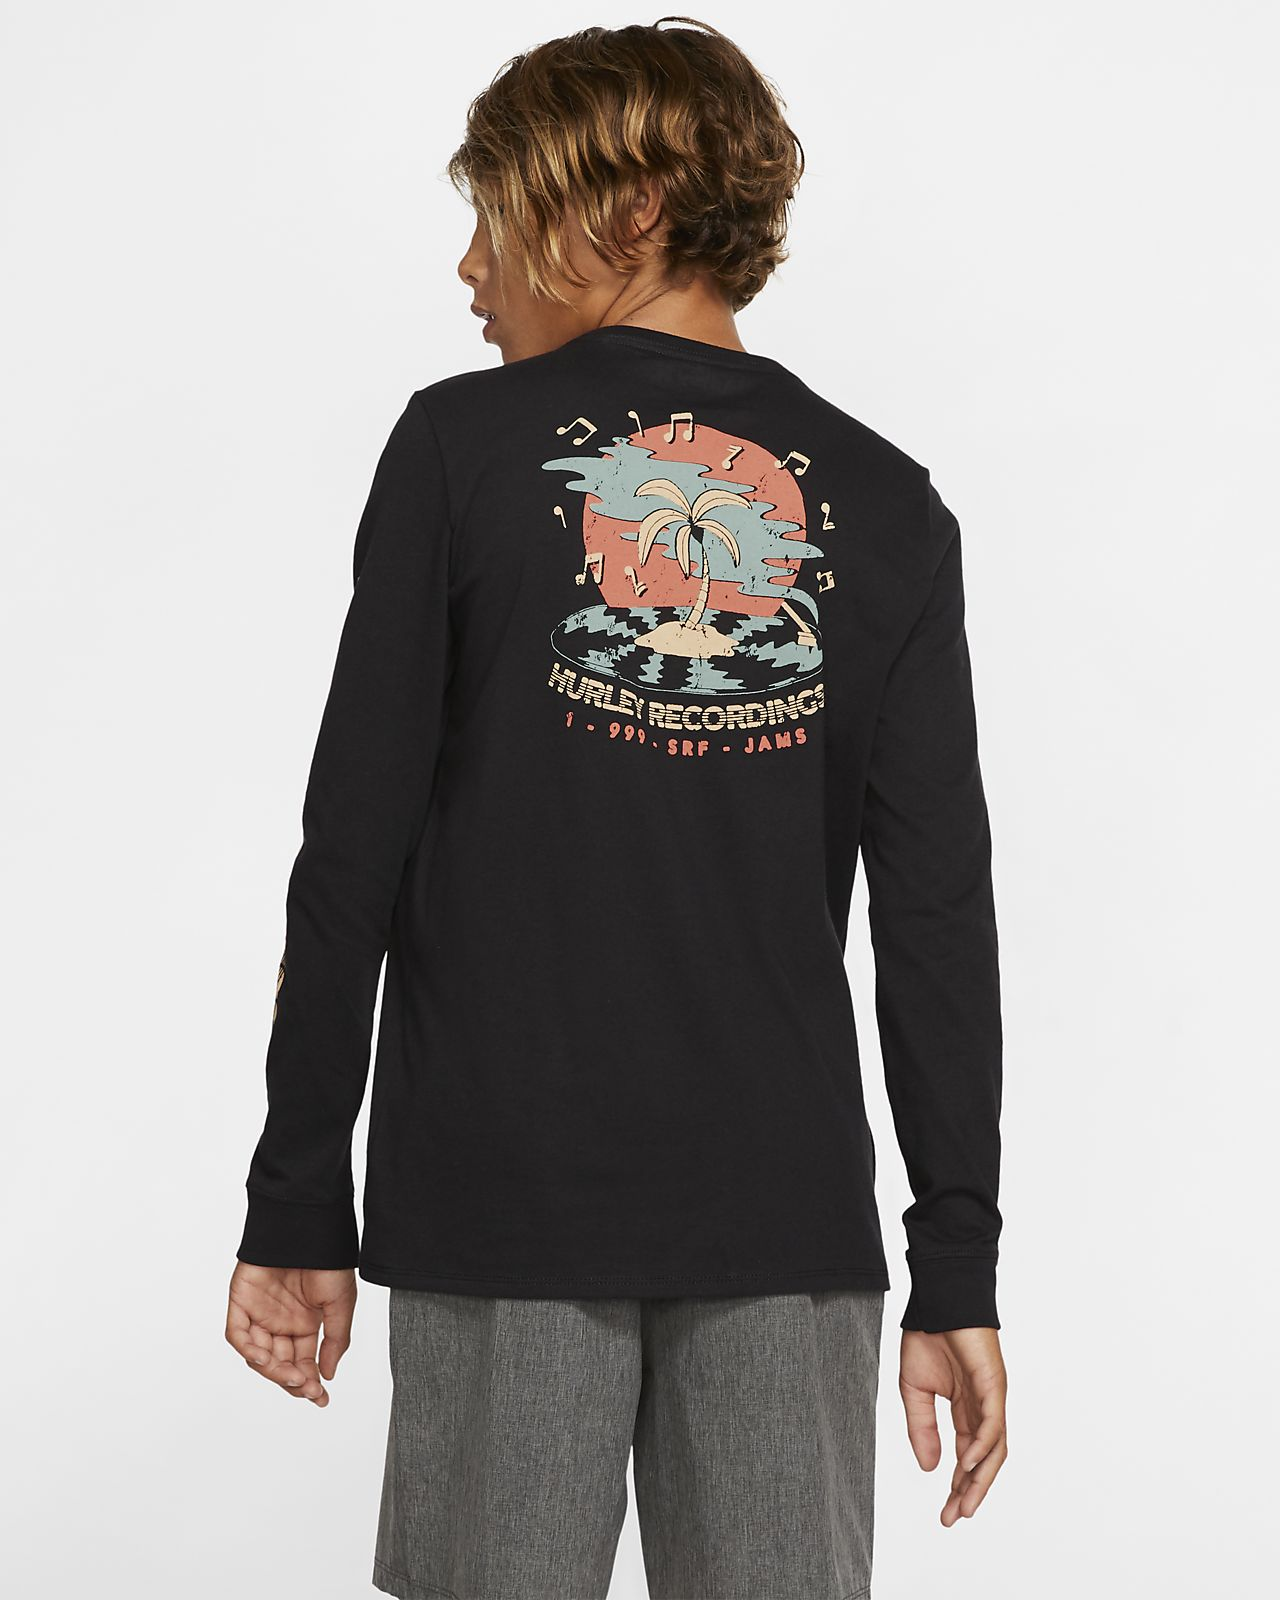 Hurley Premium Record Palms Boys' Long Sleeve T Shirt